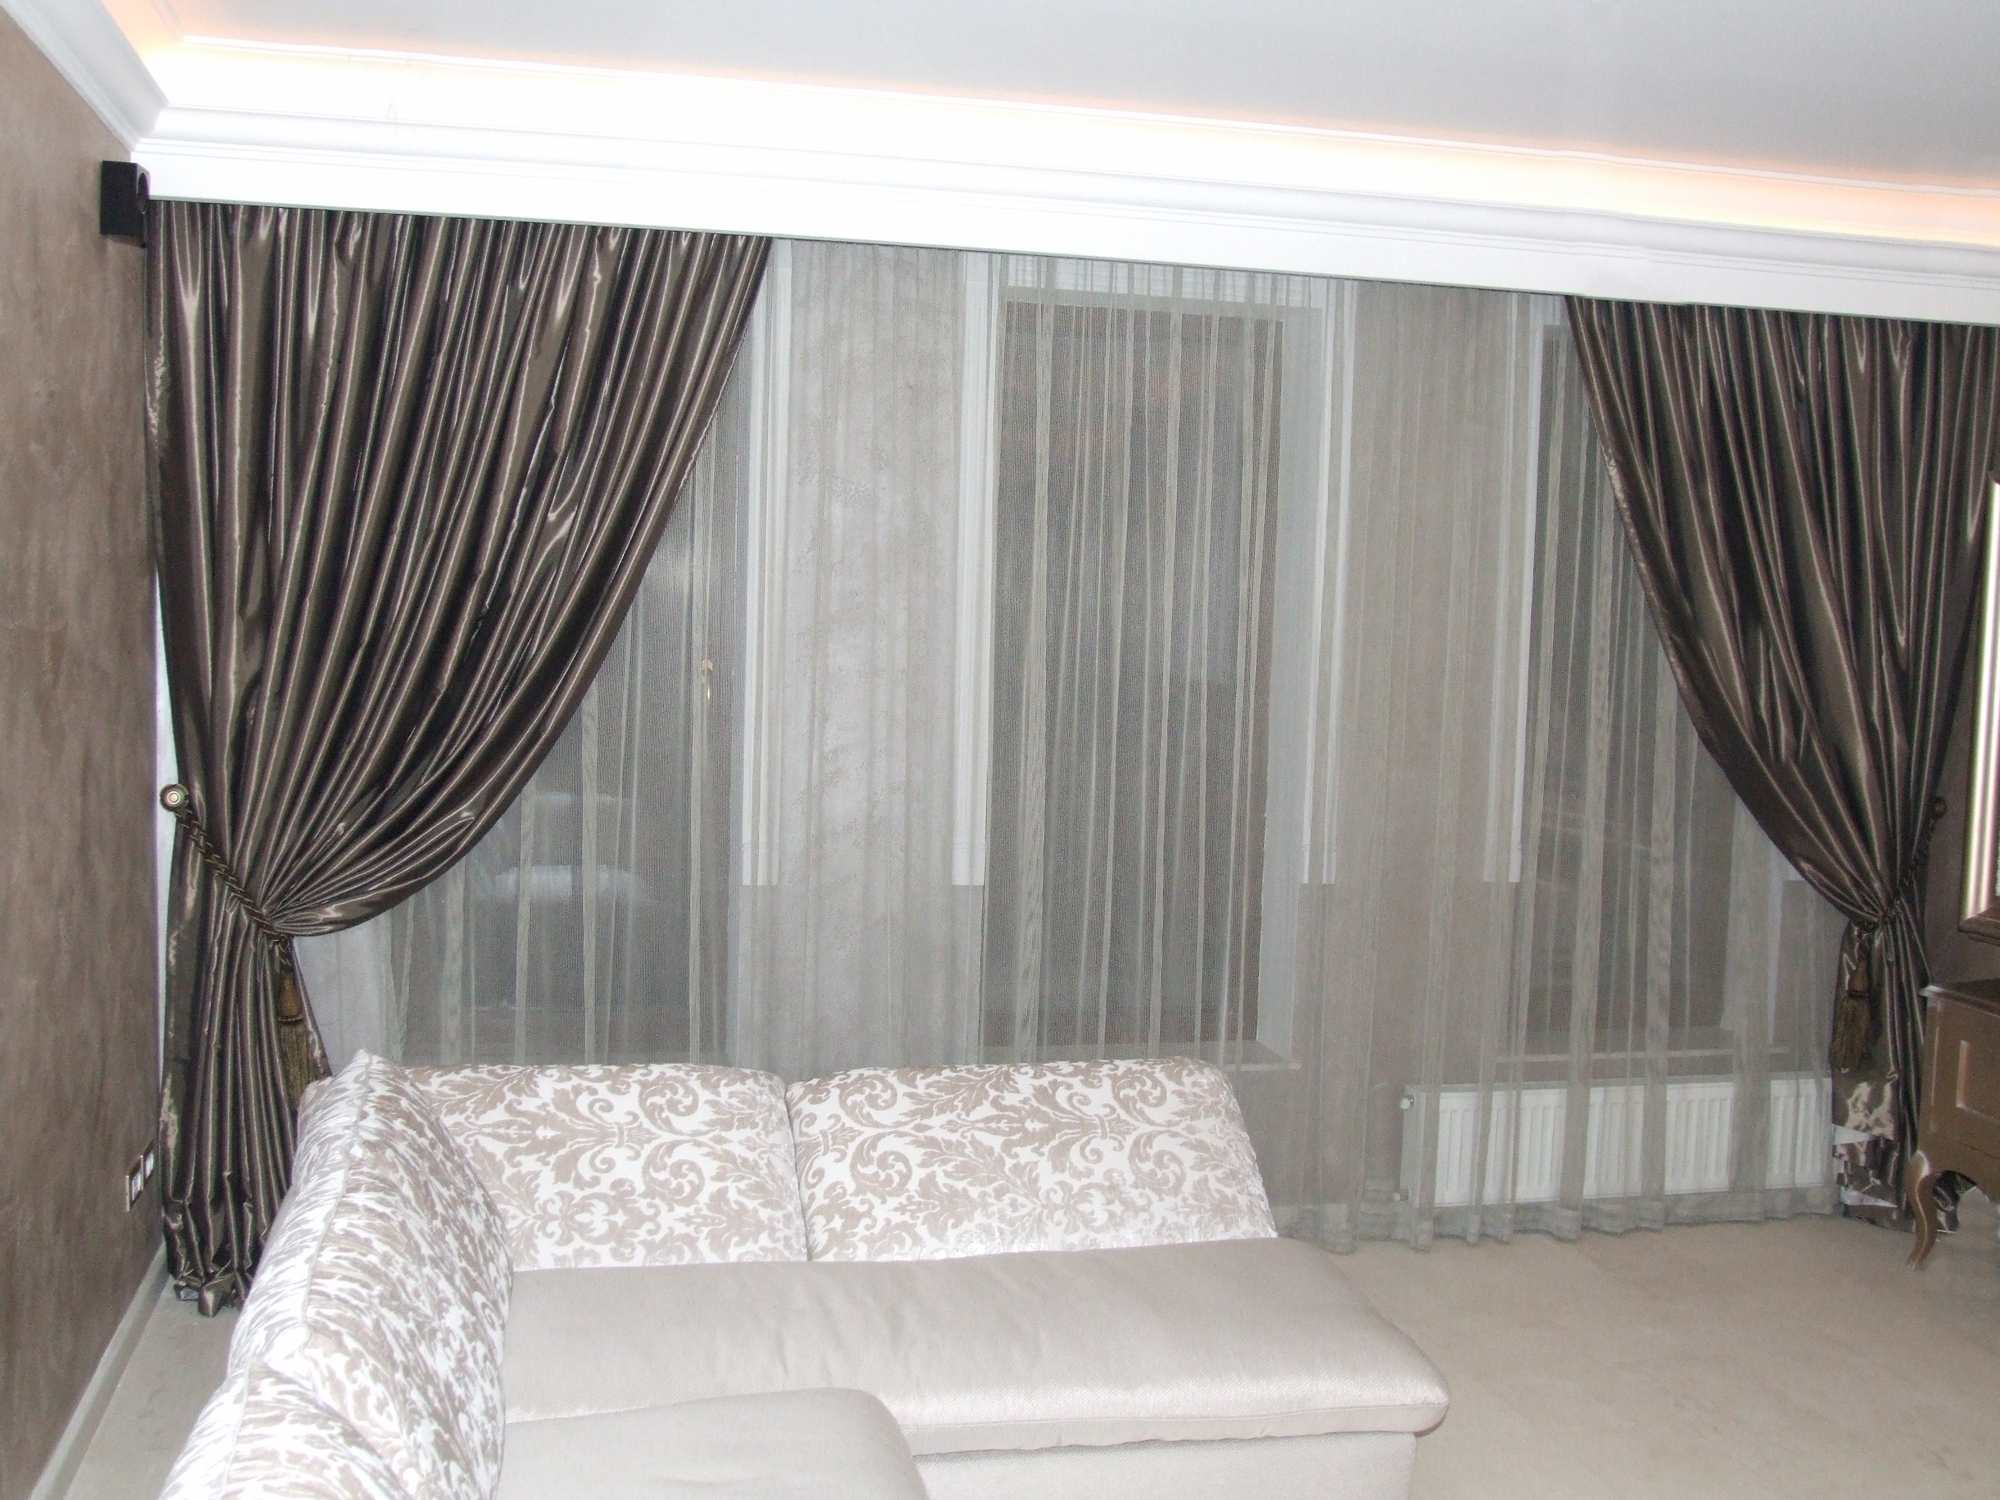 Perdele si draperii din materiale textile VRIESCO - Poza 1